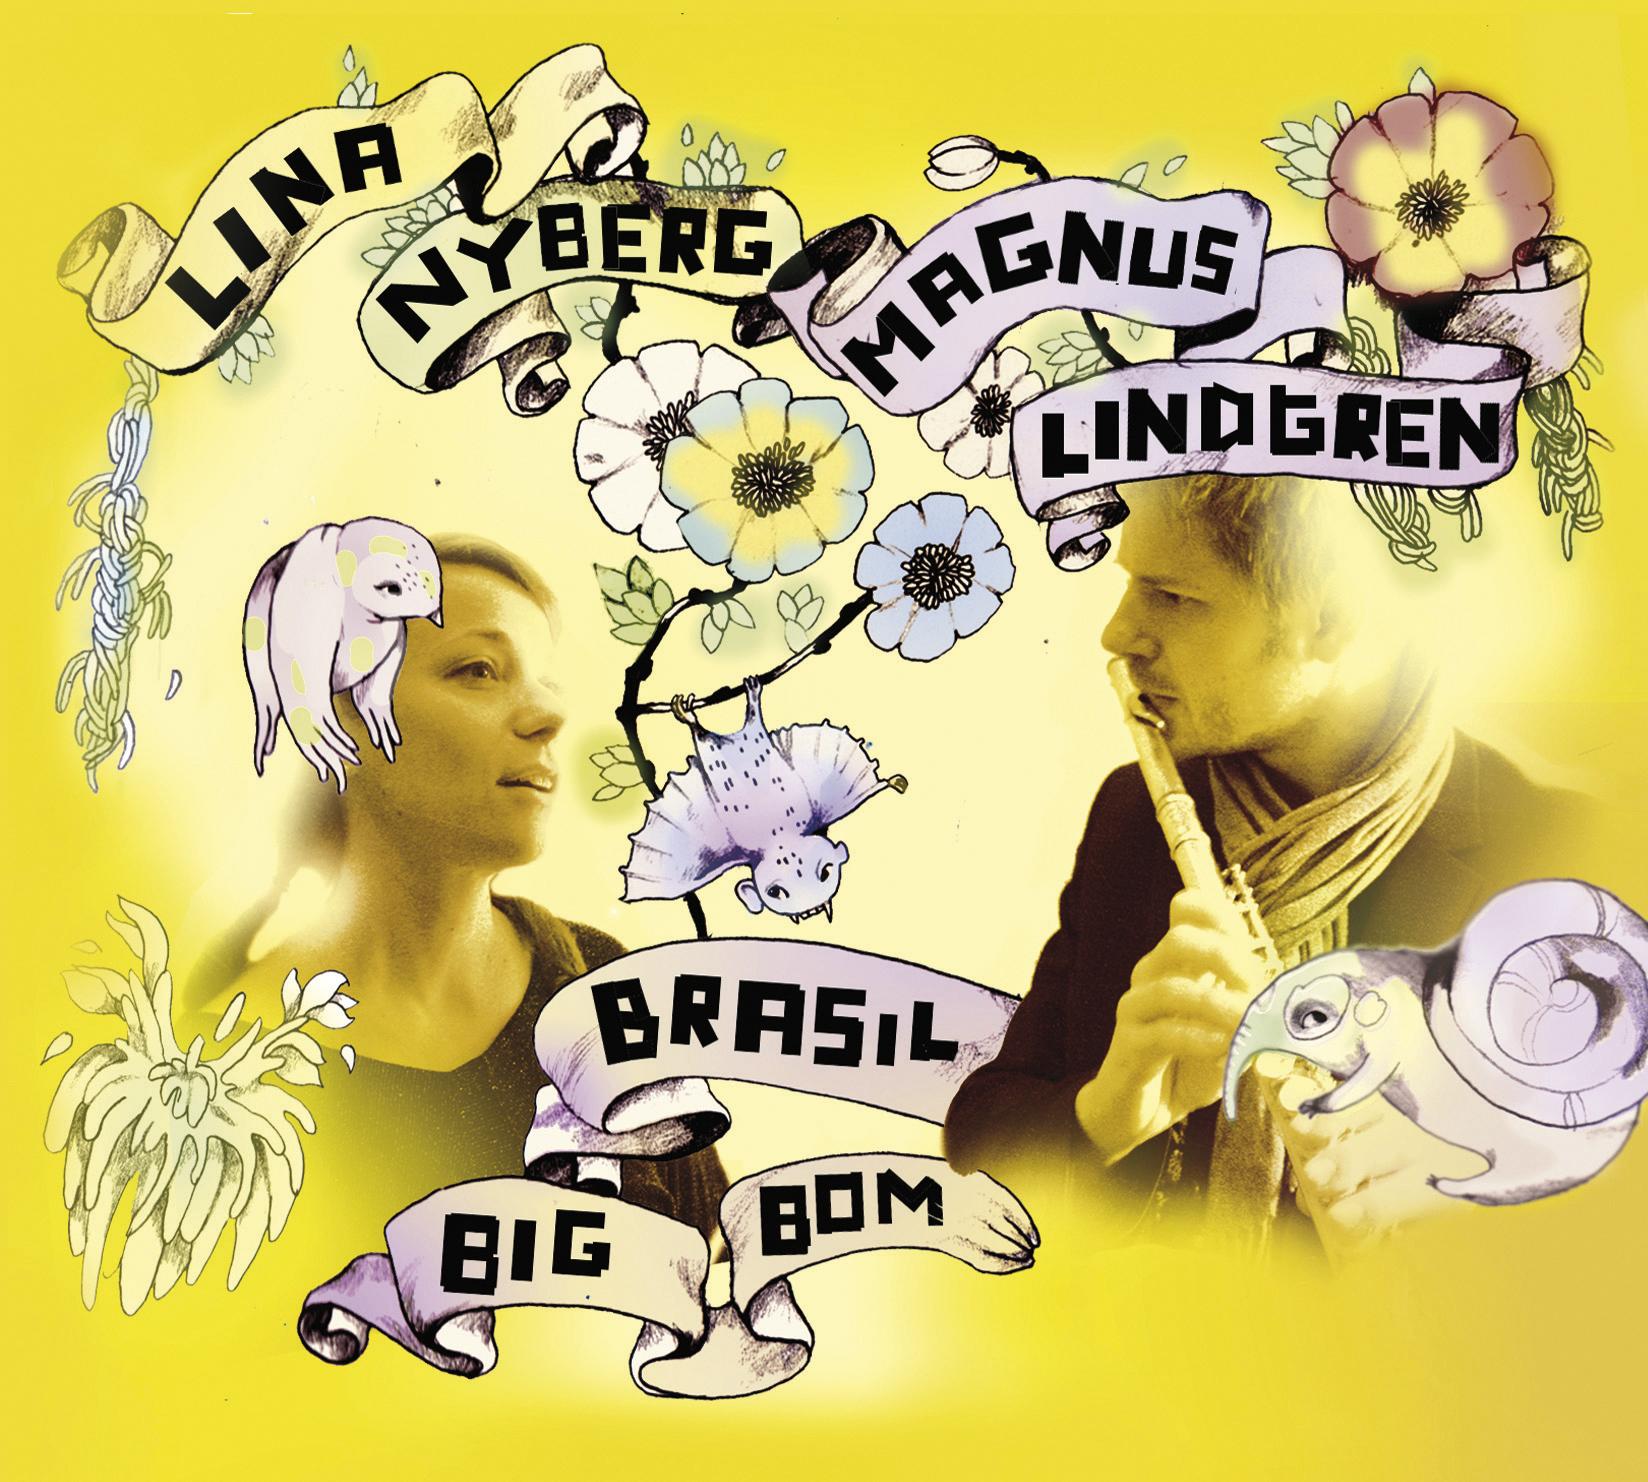 Lina Nyberg & Magnus Lindgren: Brasil Big Bom